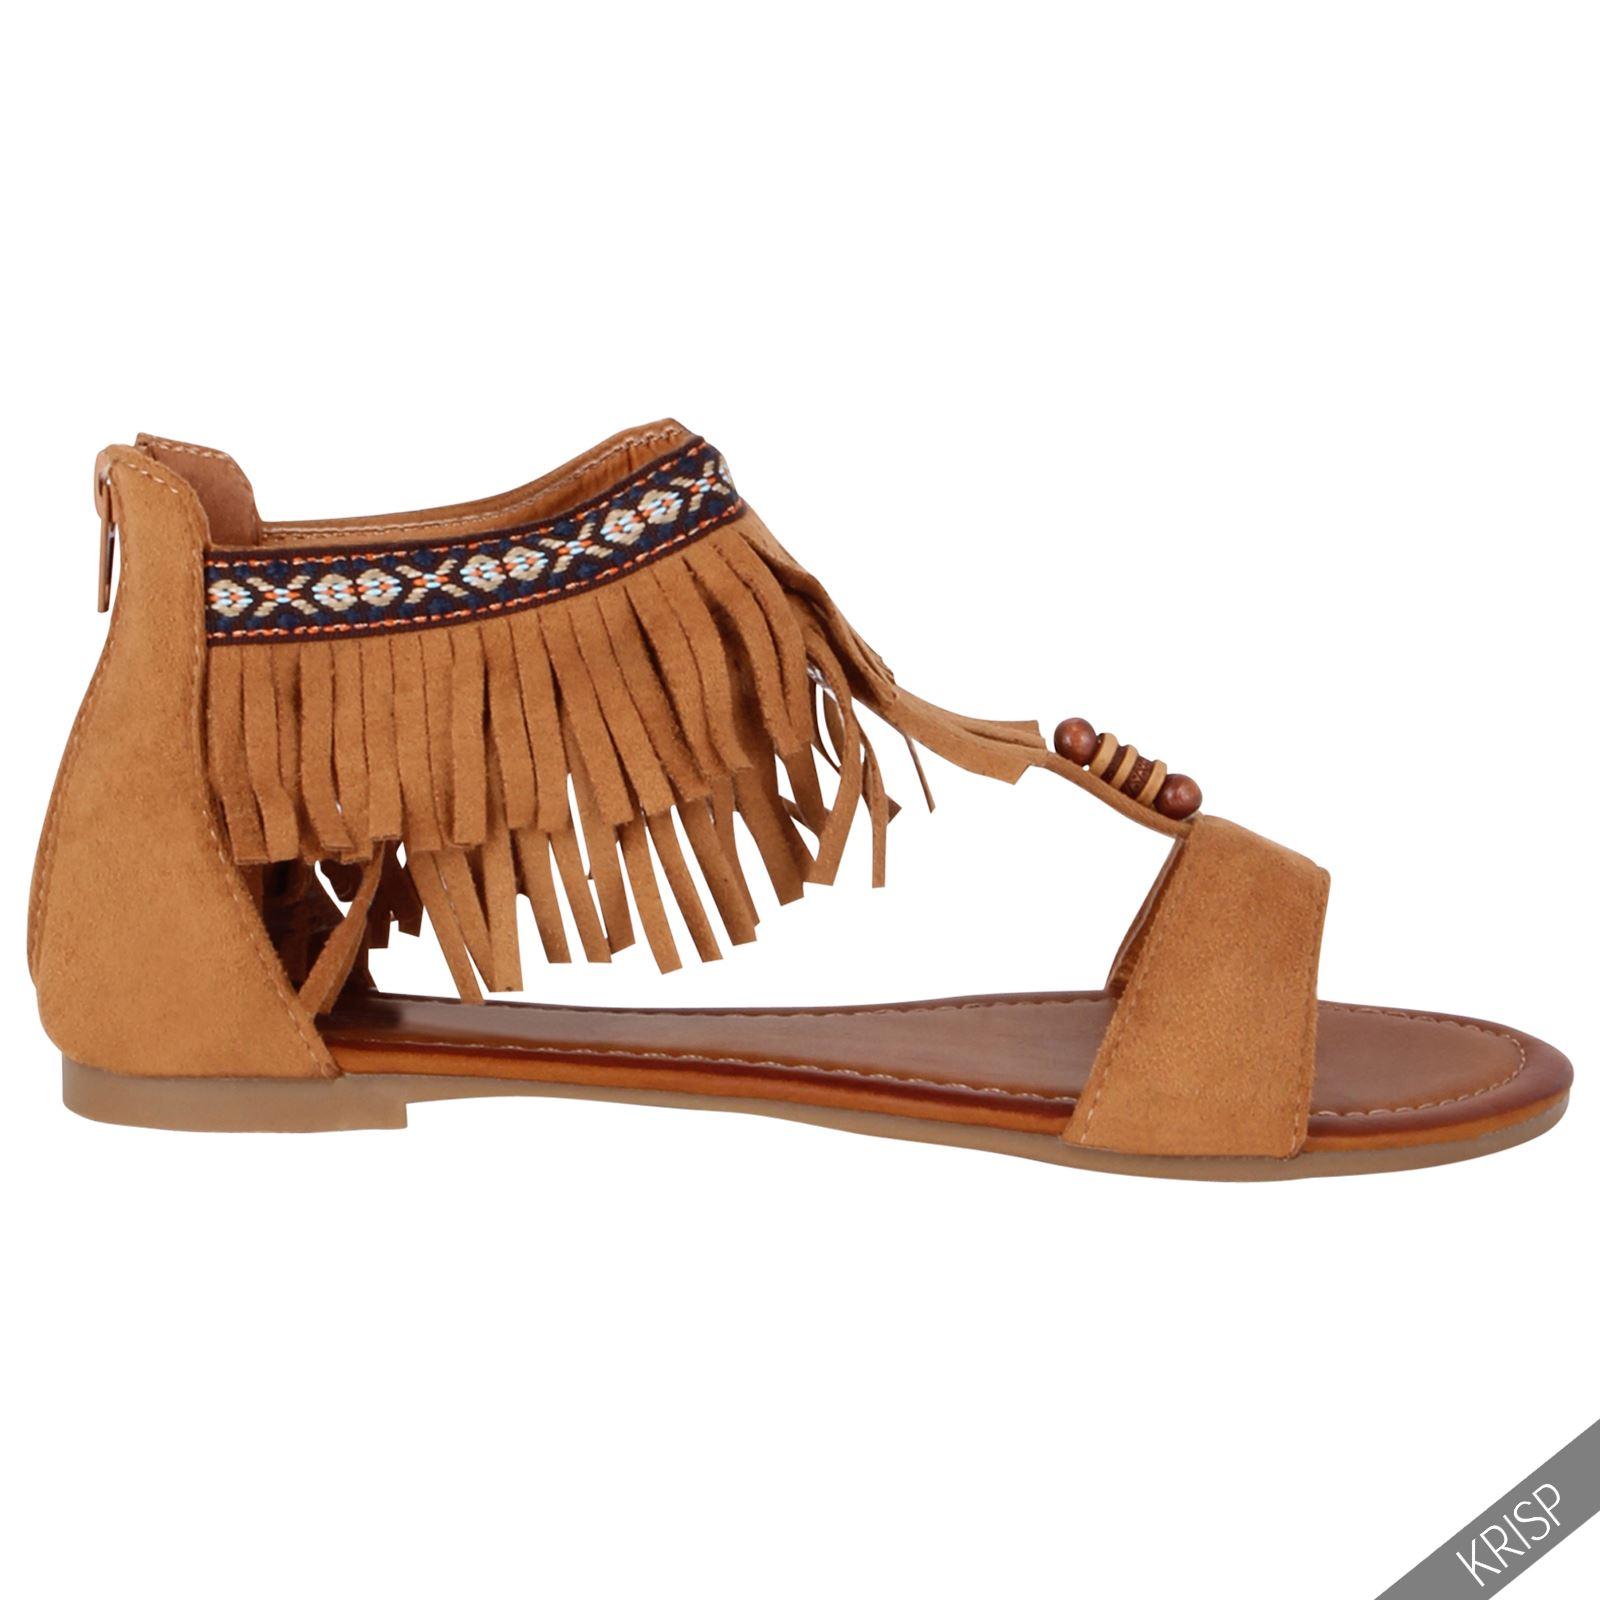 Minnetonka Shoes Uk